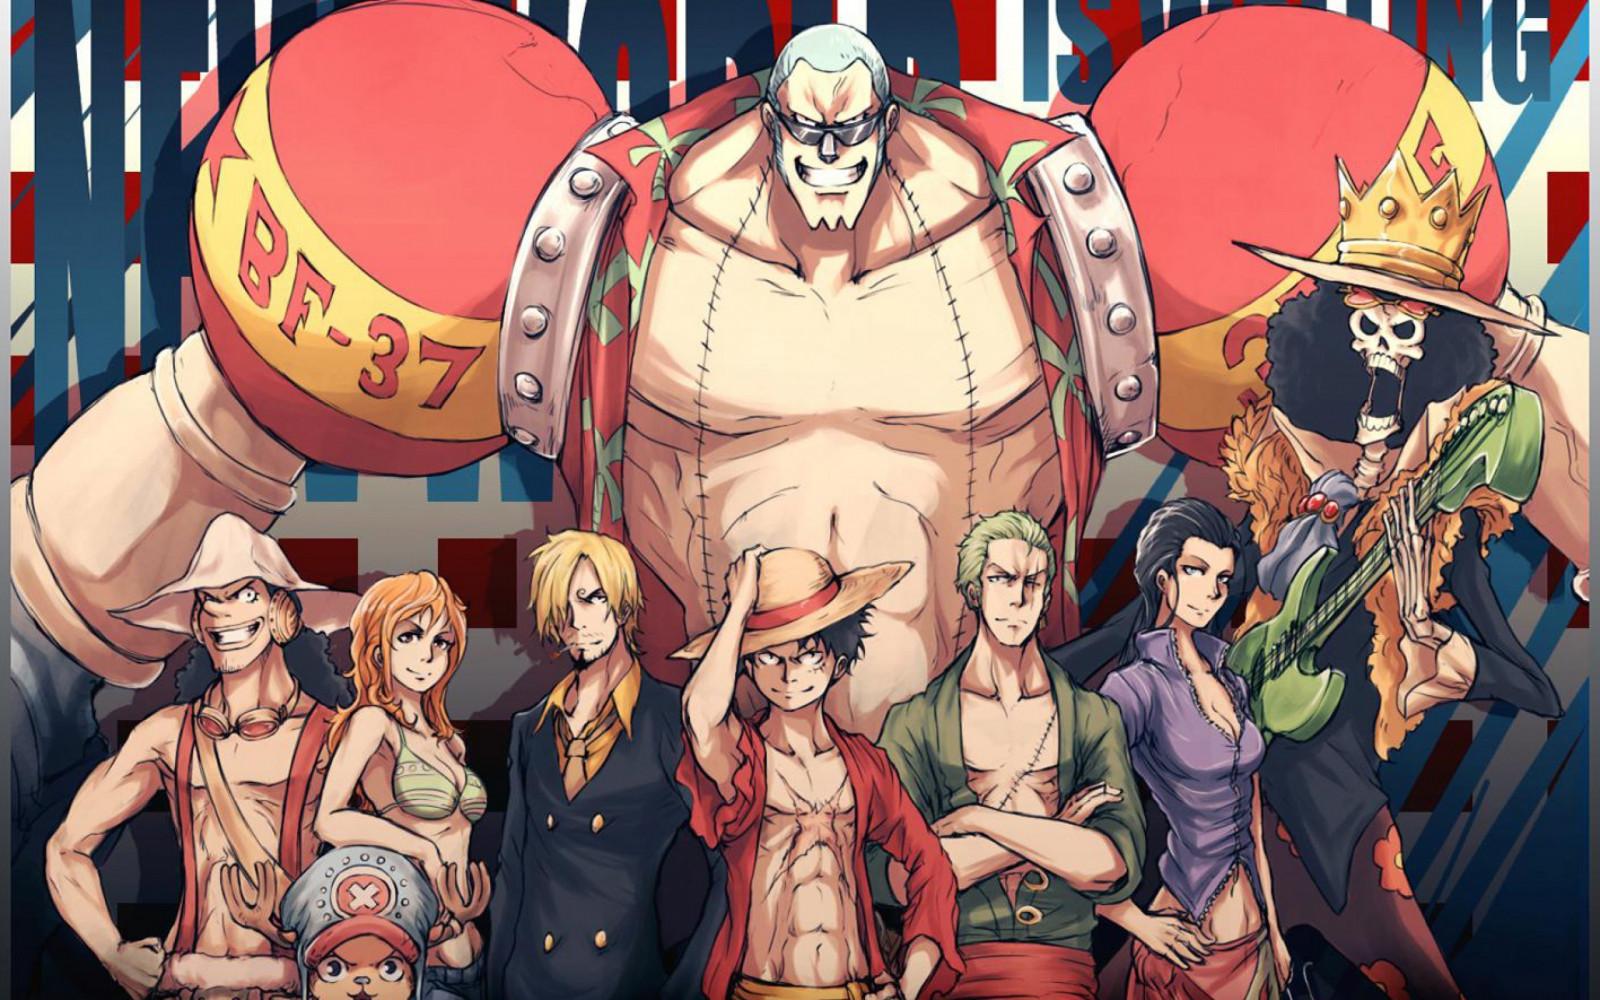 Fond d 39 cran illustration anime manga dessin anim - One piece equipage luffy ...